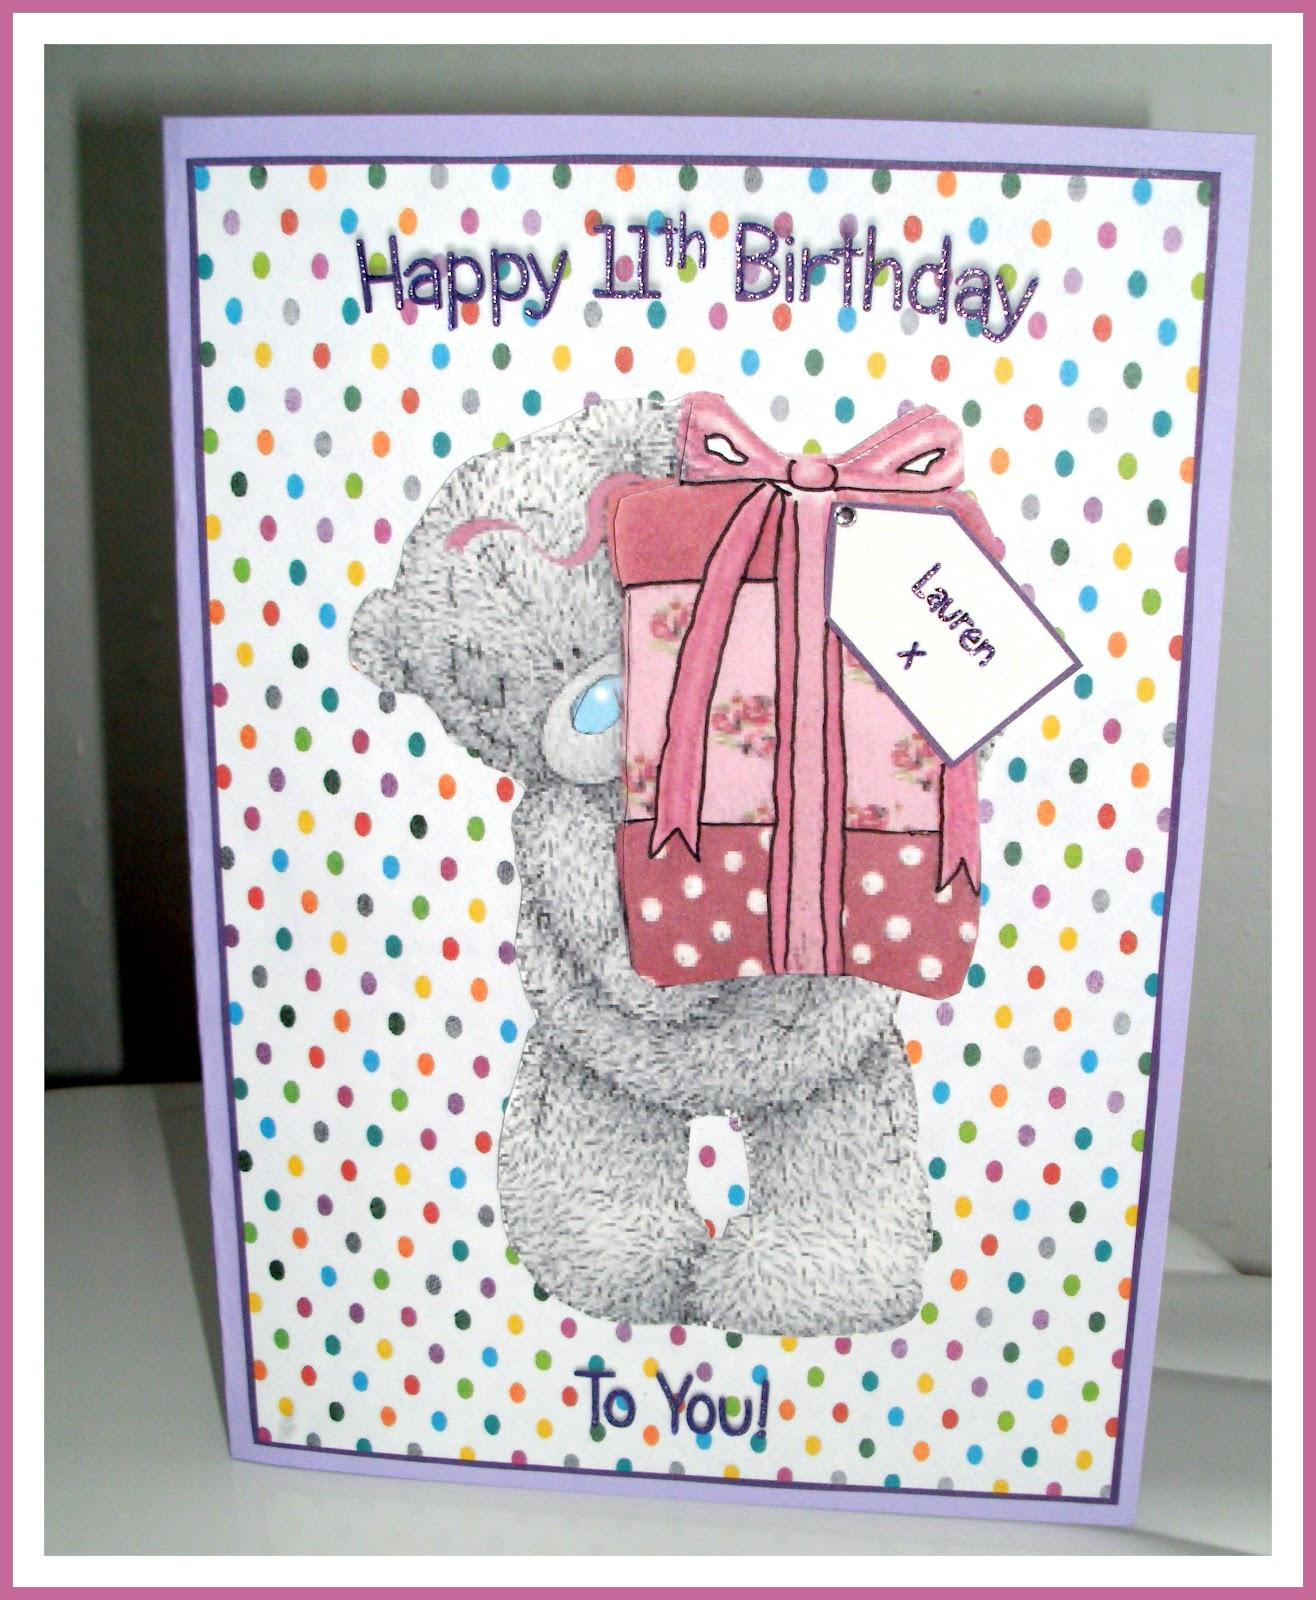 CardAdore Tatty Teddy 11th Birthday Card For Cousin